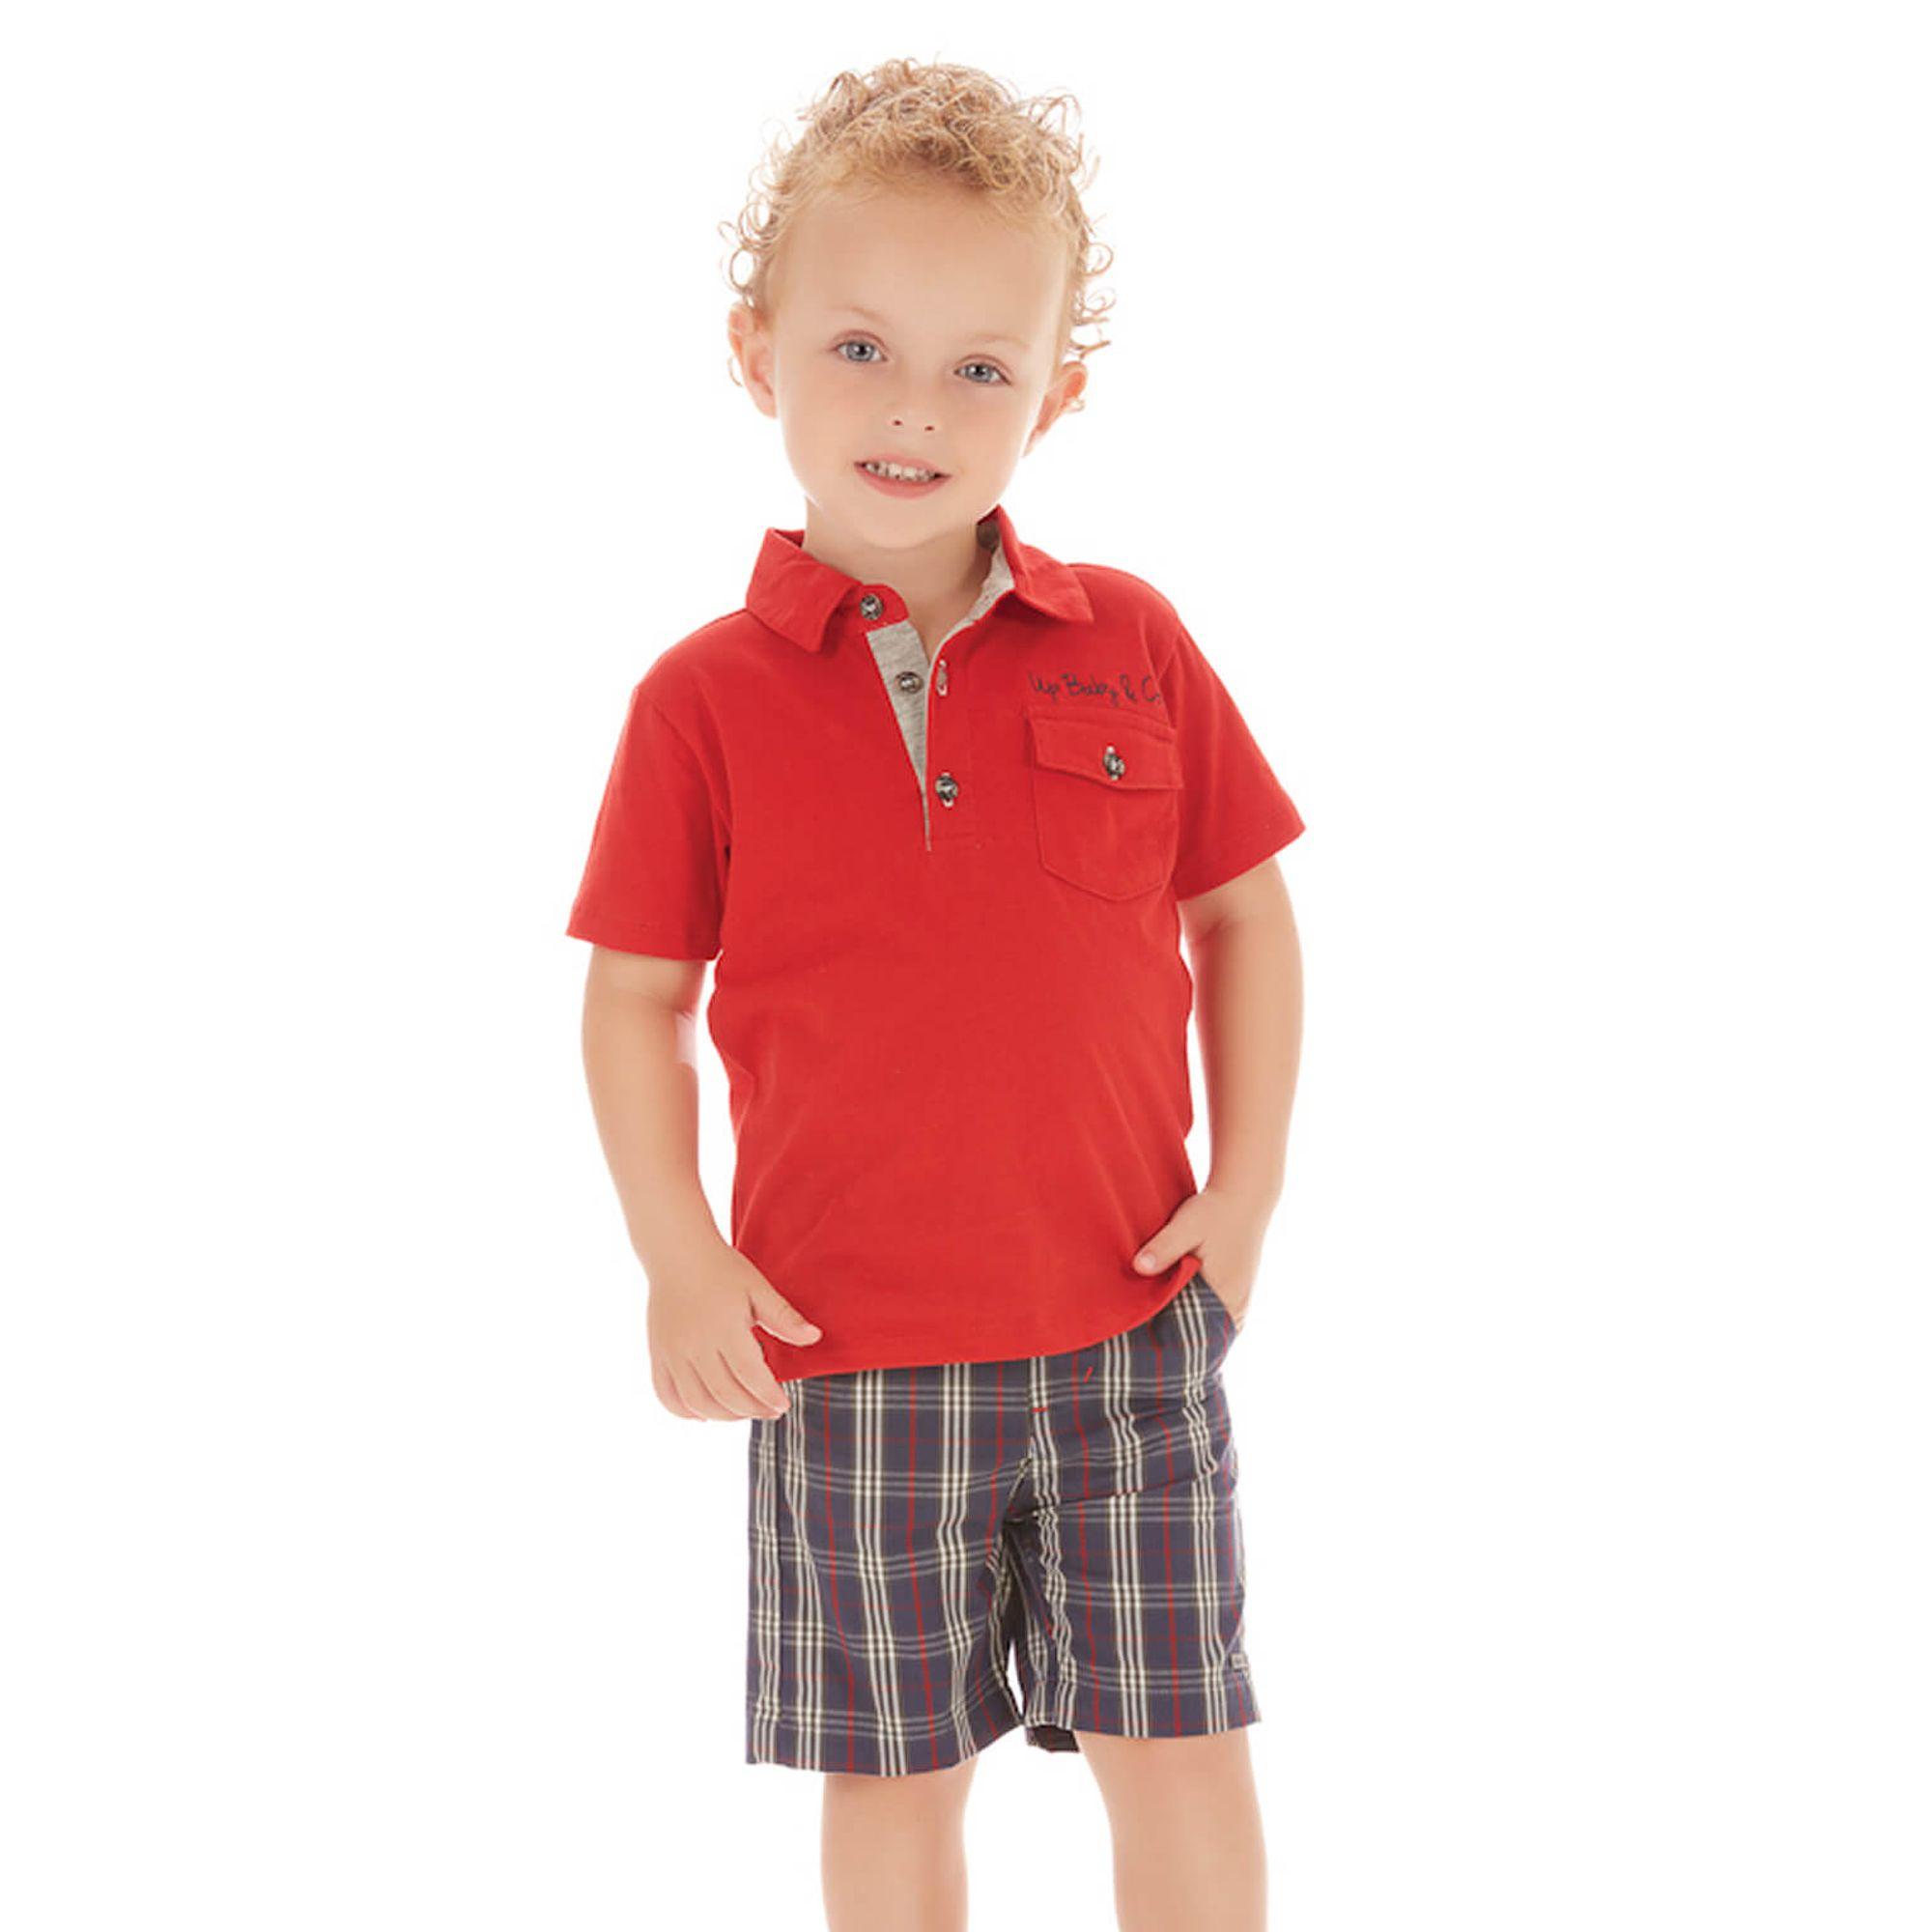 conjunto-menino-polo-vermelha-e-bermuda-xadrez-marinho